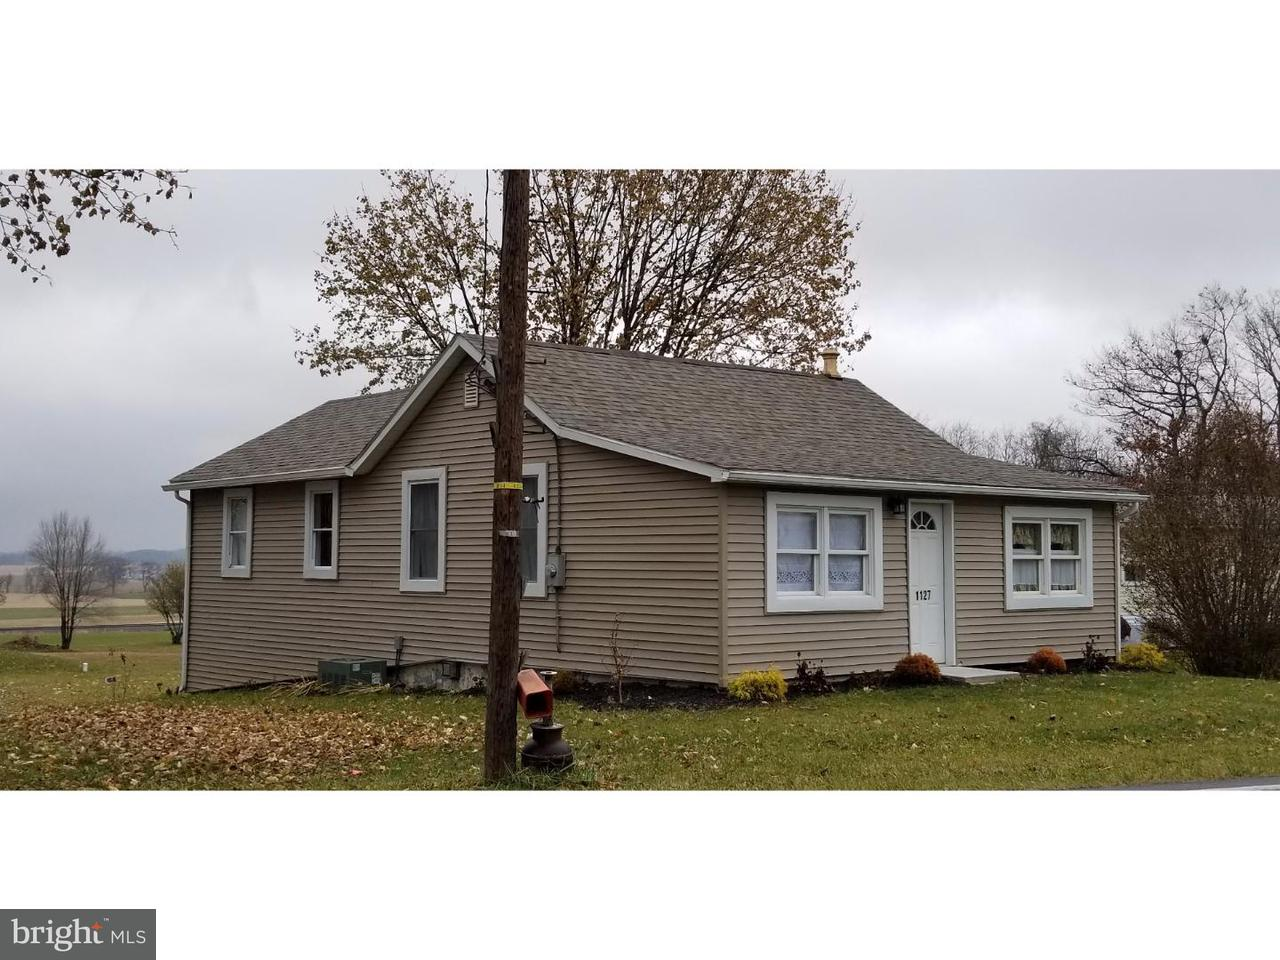 Single Family Home for Rent at 1127 StreetATE Street Mertztown, Pennsylvania 19539 United States